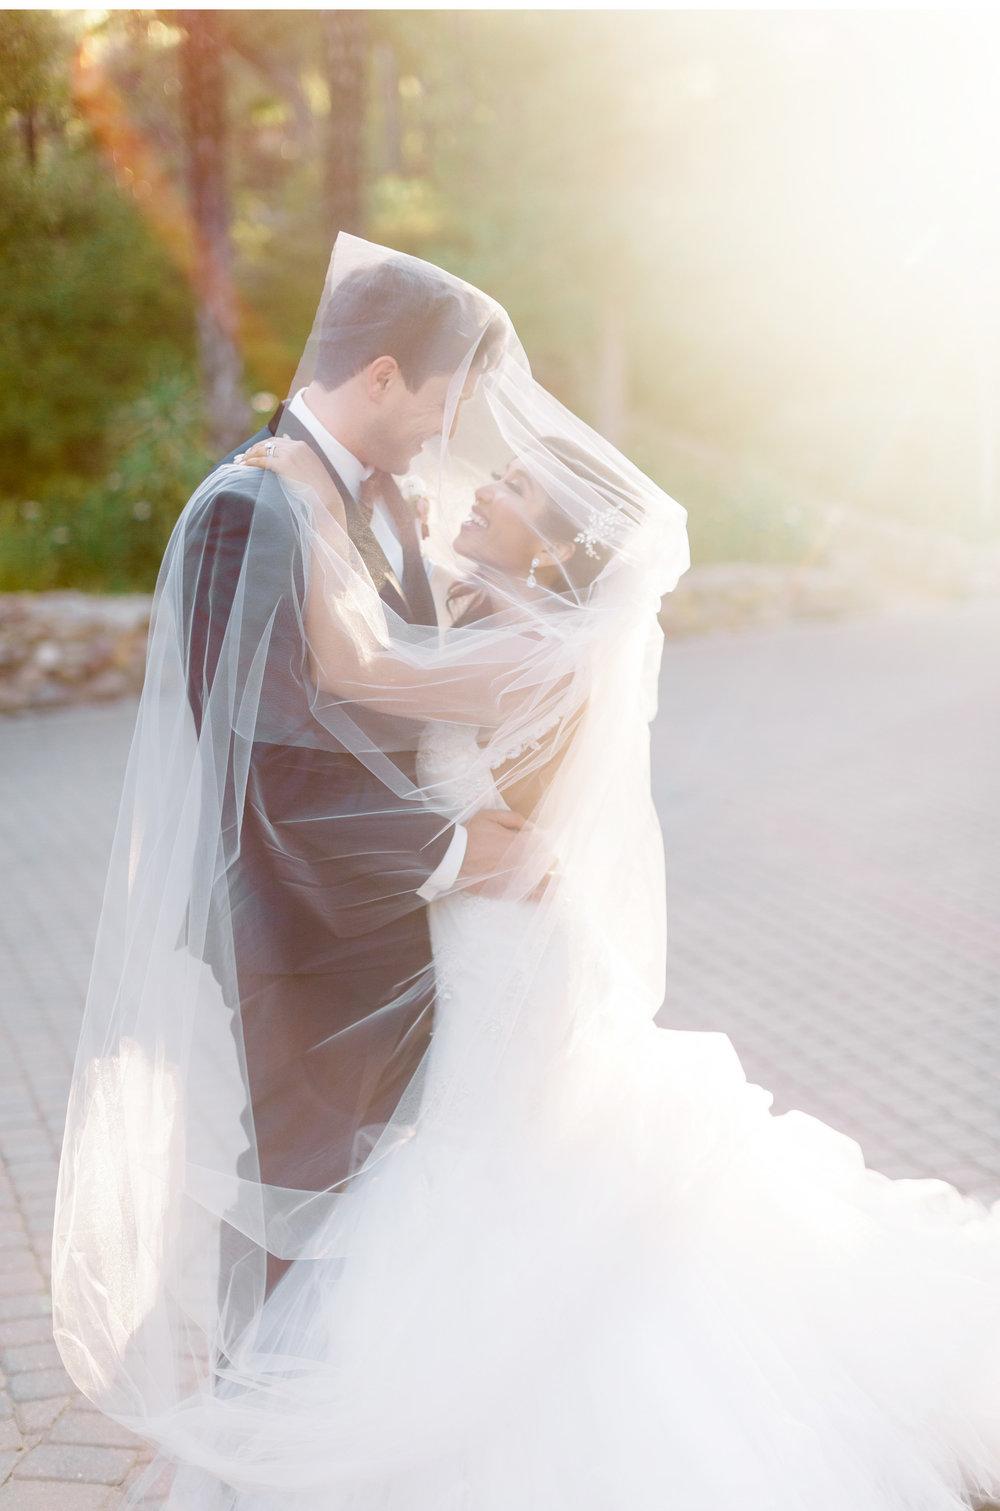 Kestrel-Park-Wedding-Natalie-Schutt-Photography_17.jpg